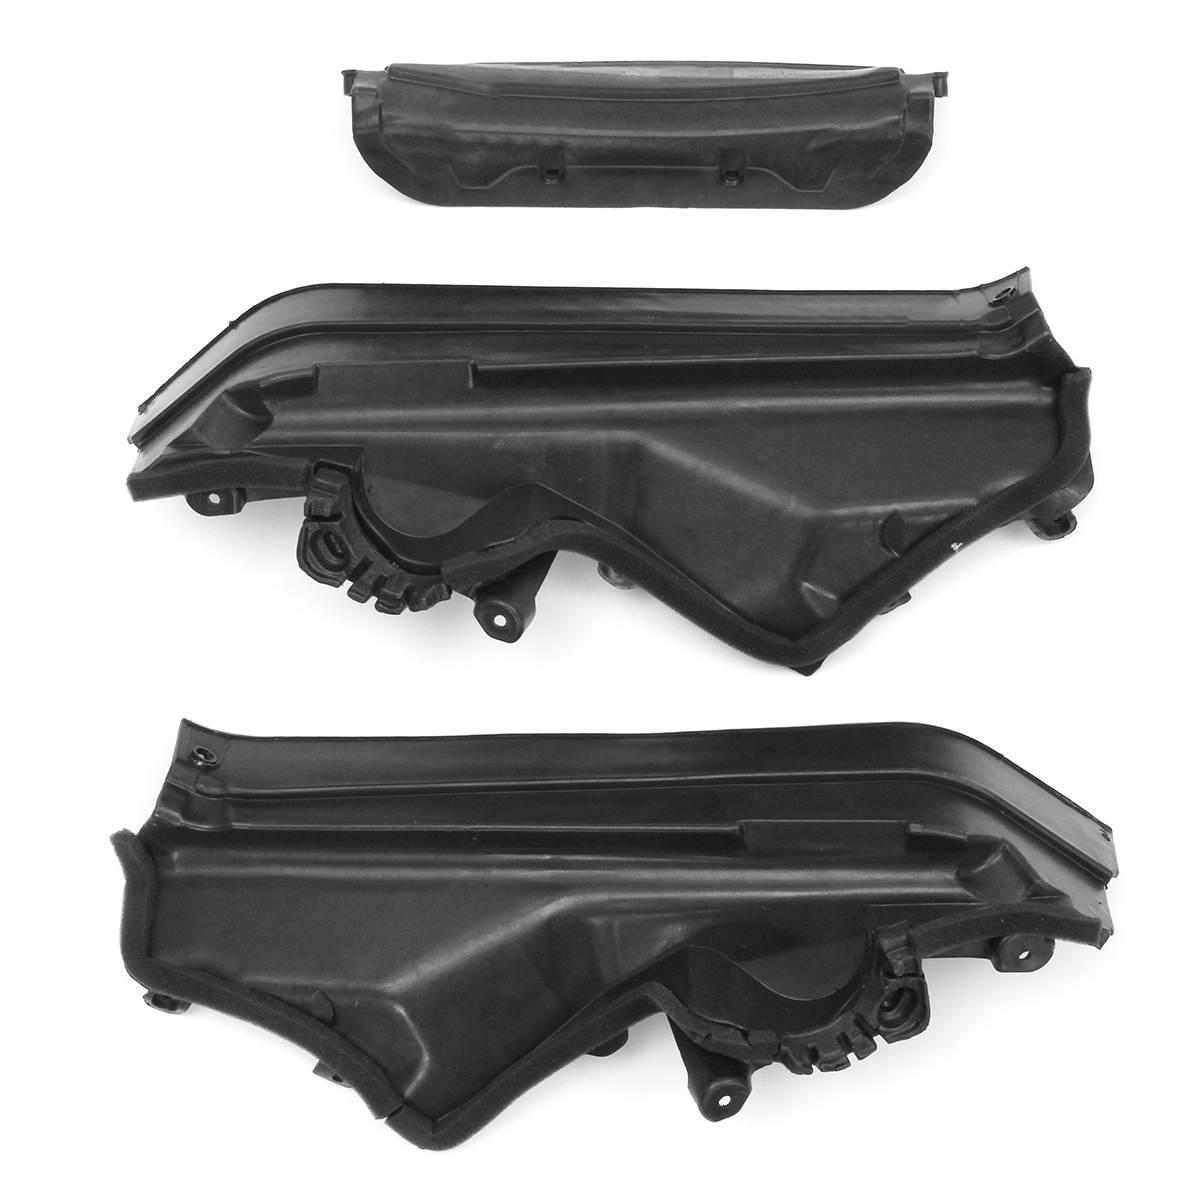 Juego de 3 uds de tabiques de compartimento superior para motor de coche de alta calidad para BMW X5 X6 E70 E71 E72 51717169419 51717169420 51717169421